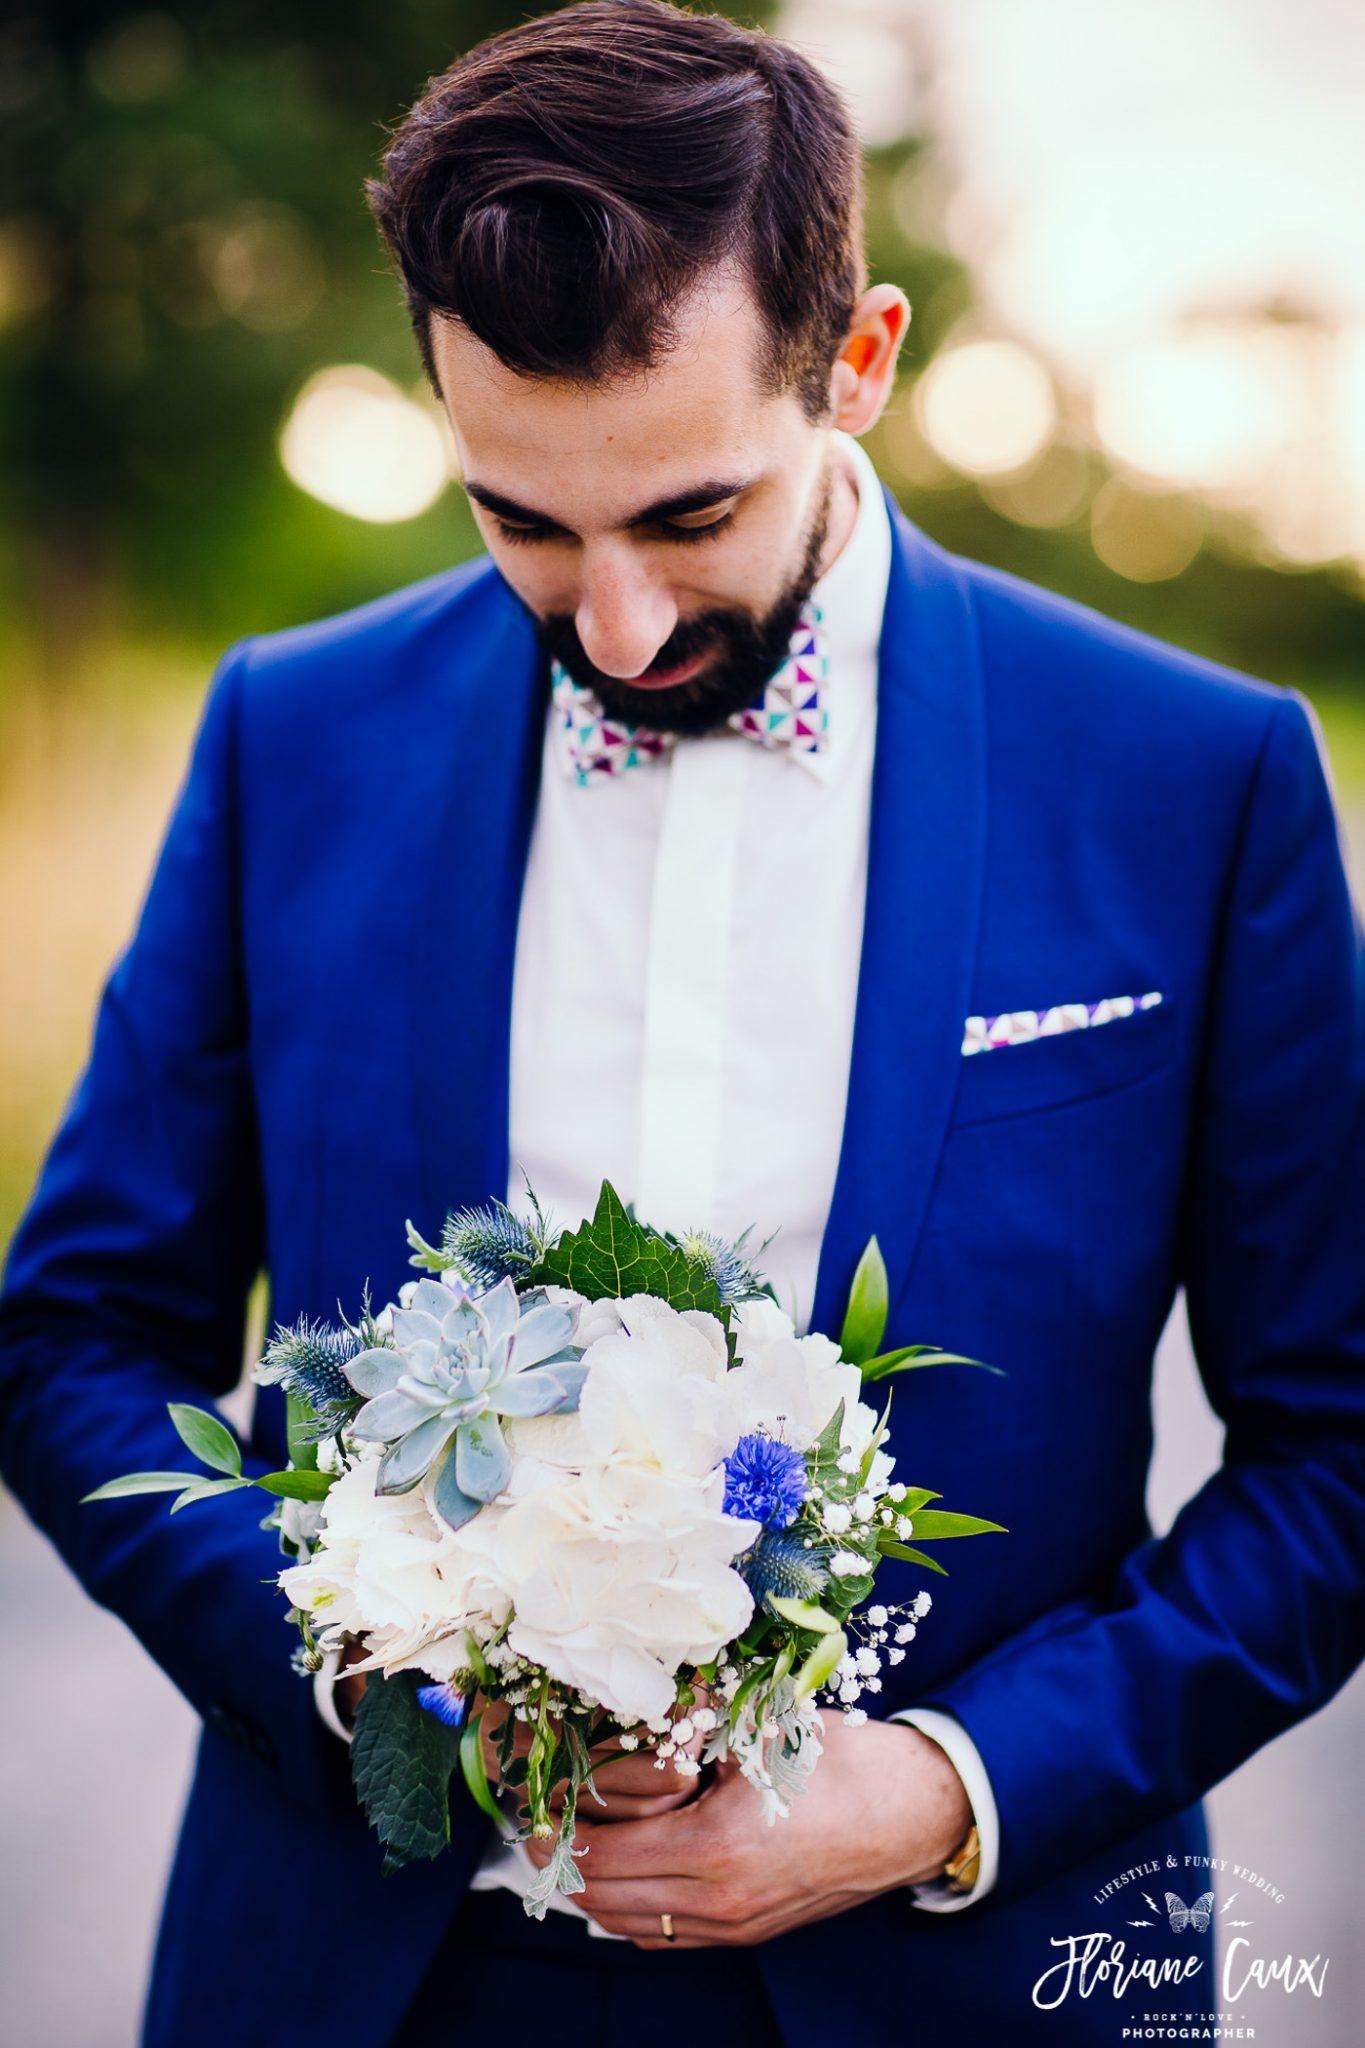 photographe-mariage-pays-basque-Floriane-Caux (61)